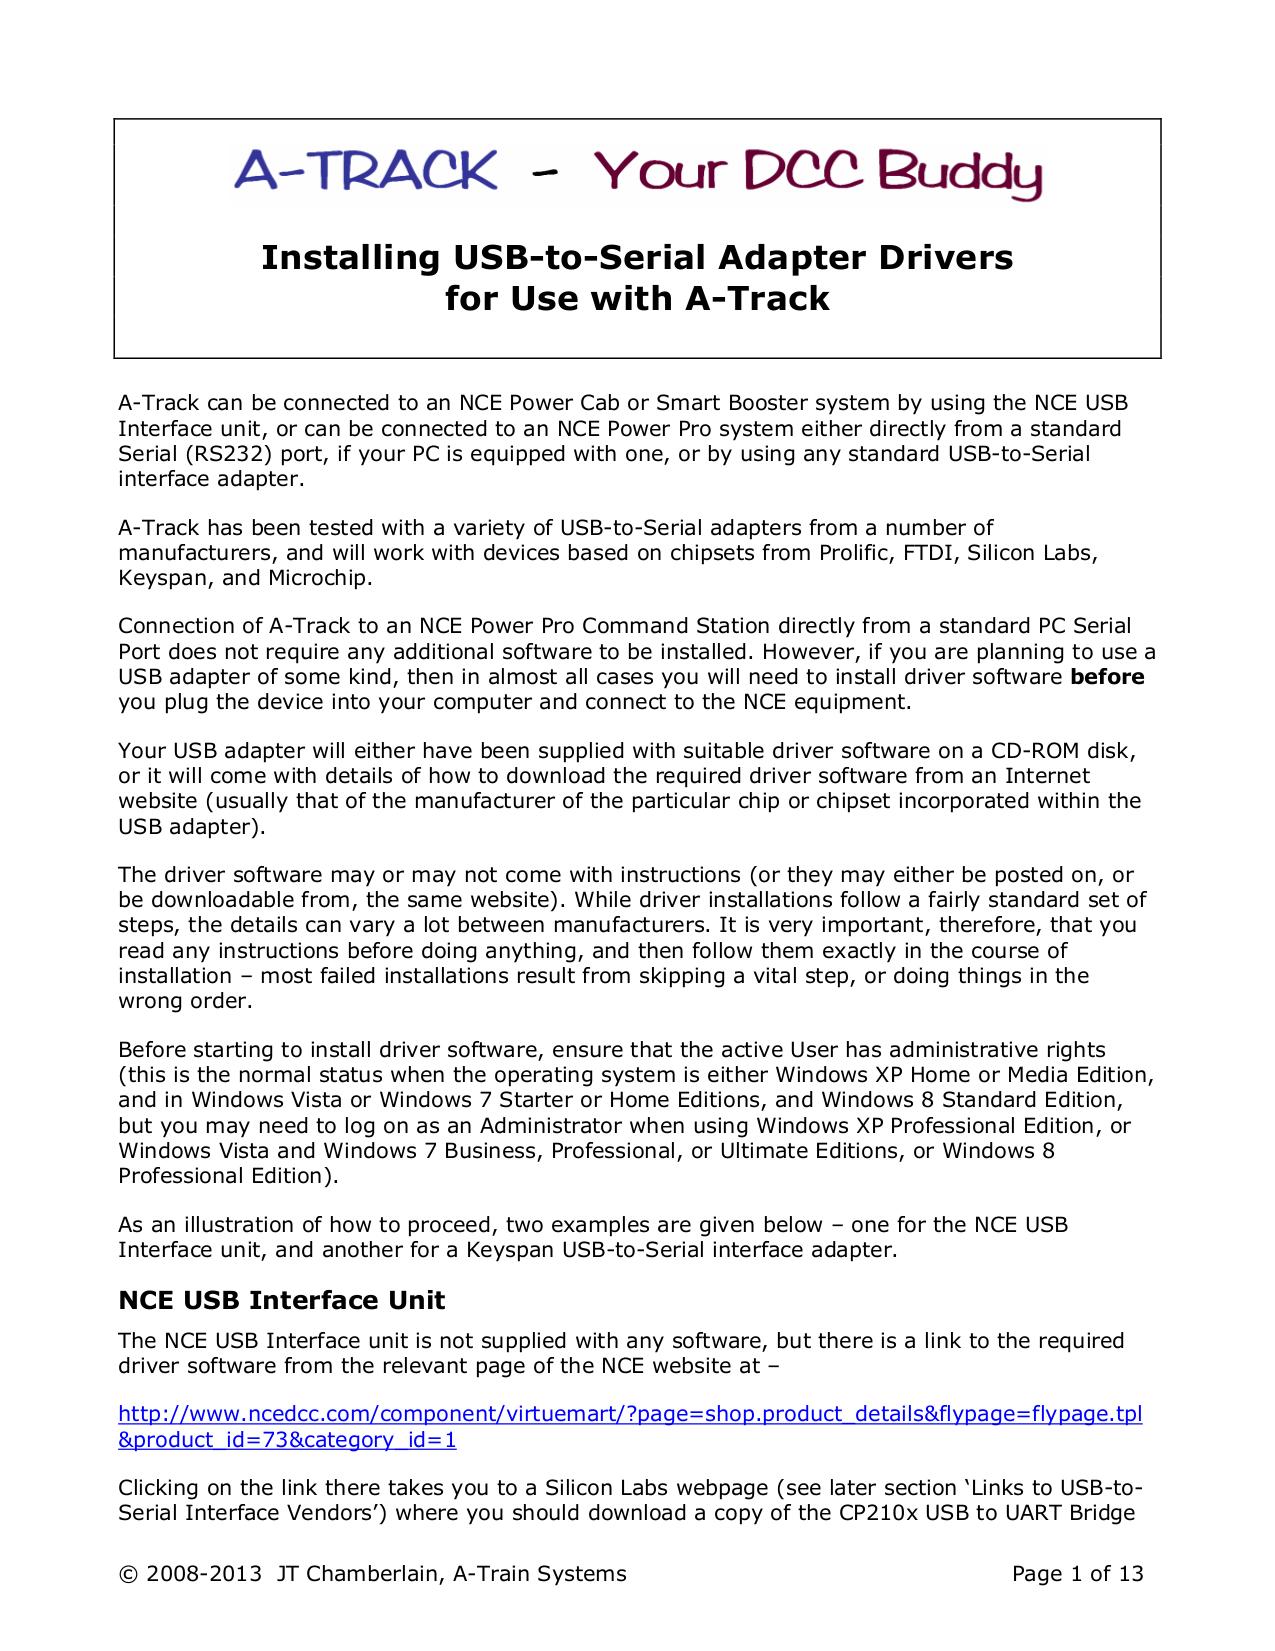 pdf for Keyspan Other USB Serial Adapter version 2.0 Software manual